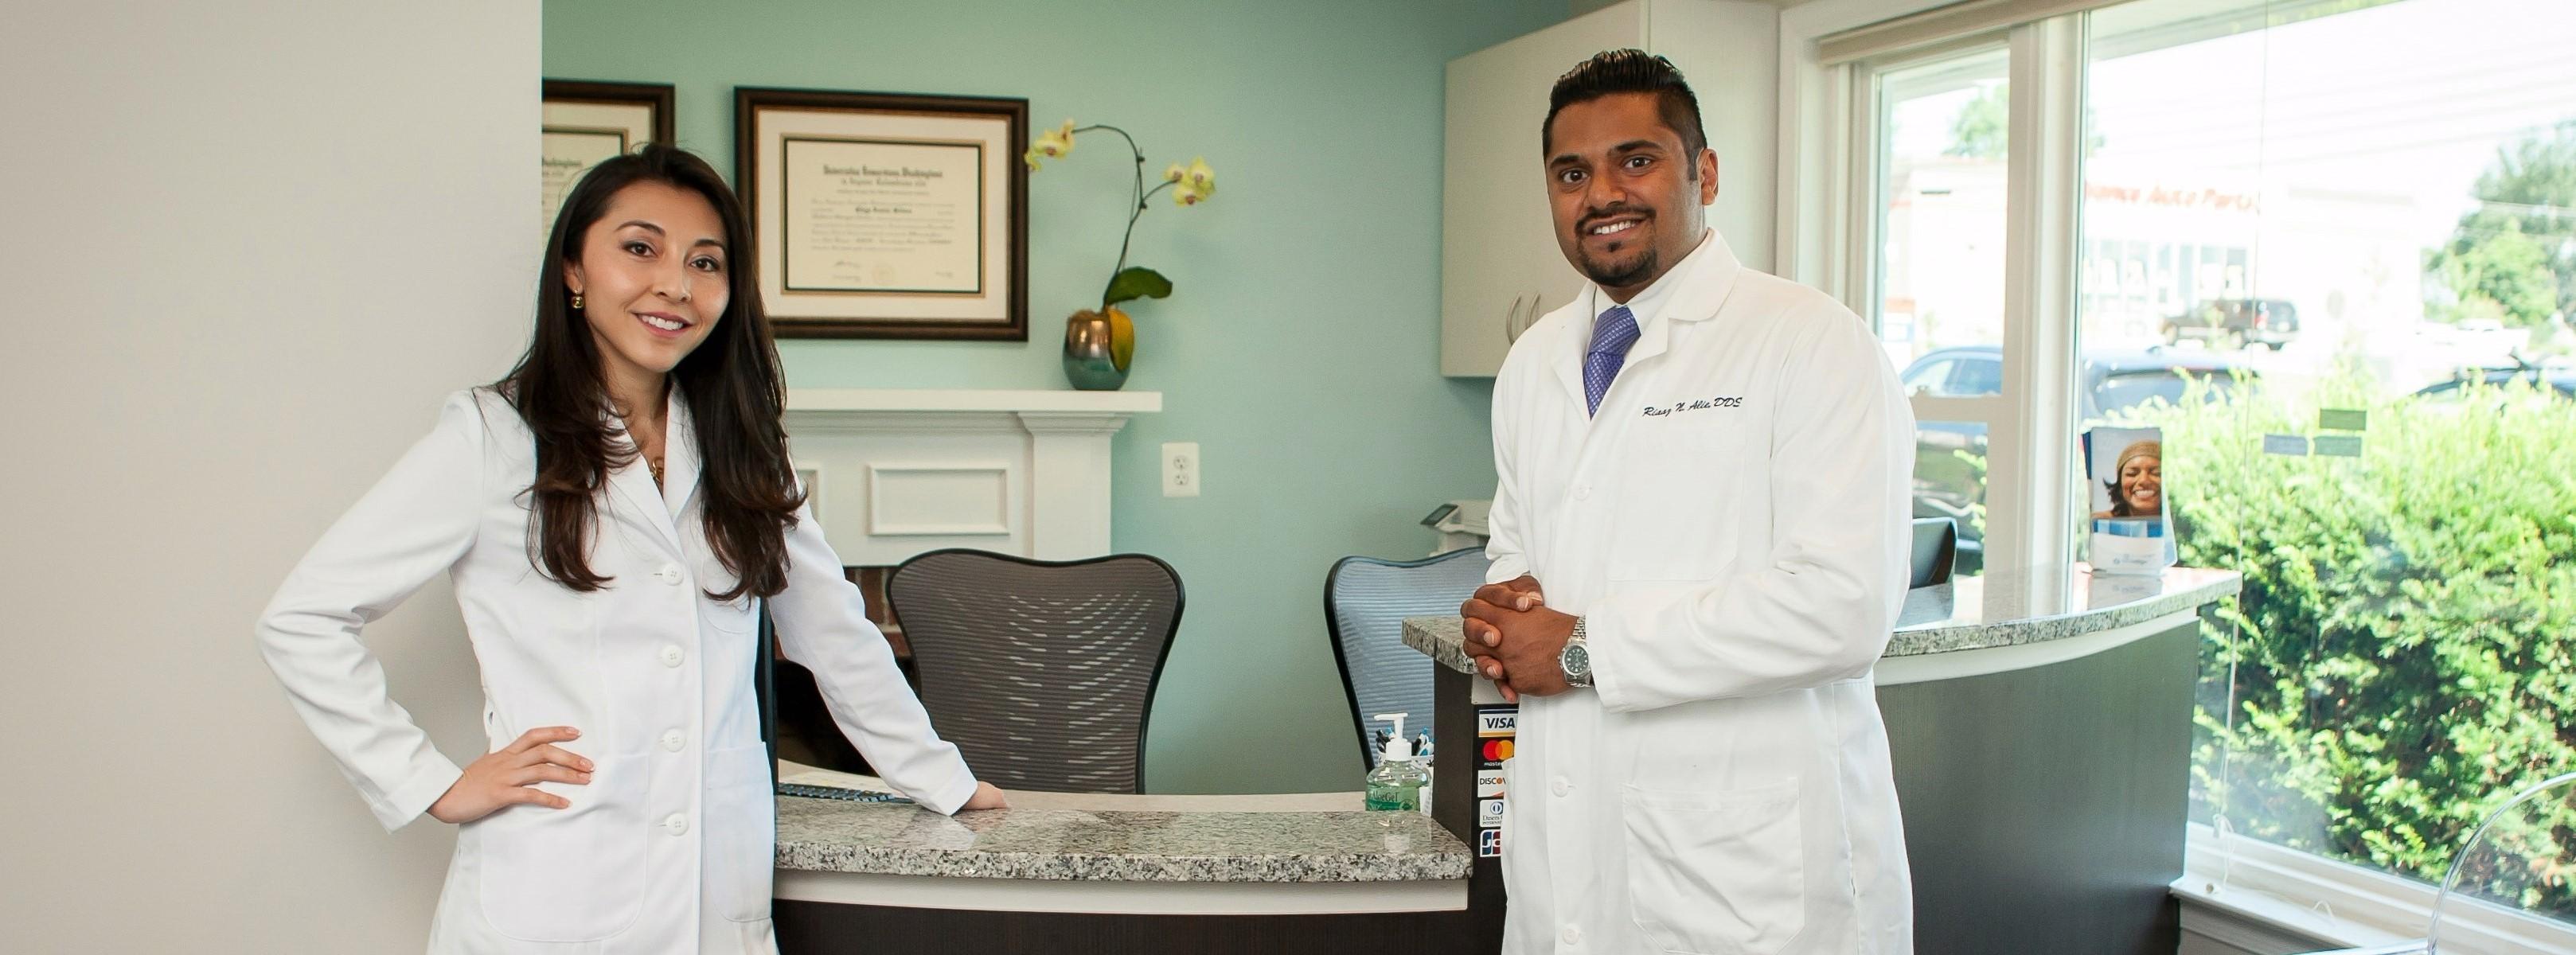 Urbana Family Dental Care reviews | Dentists at 3370 Urbana Pike - Ijamsville MD